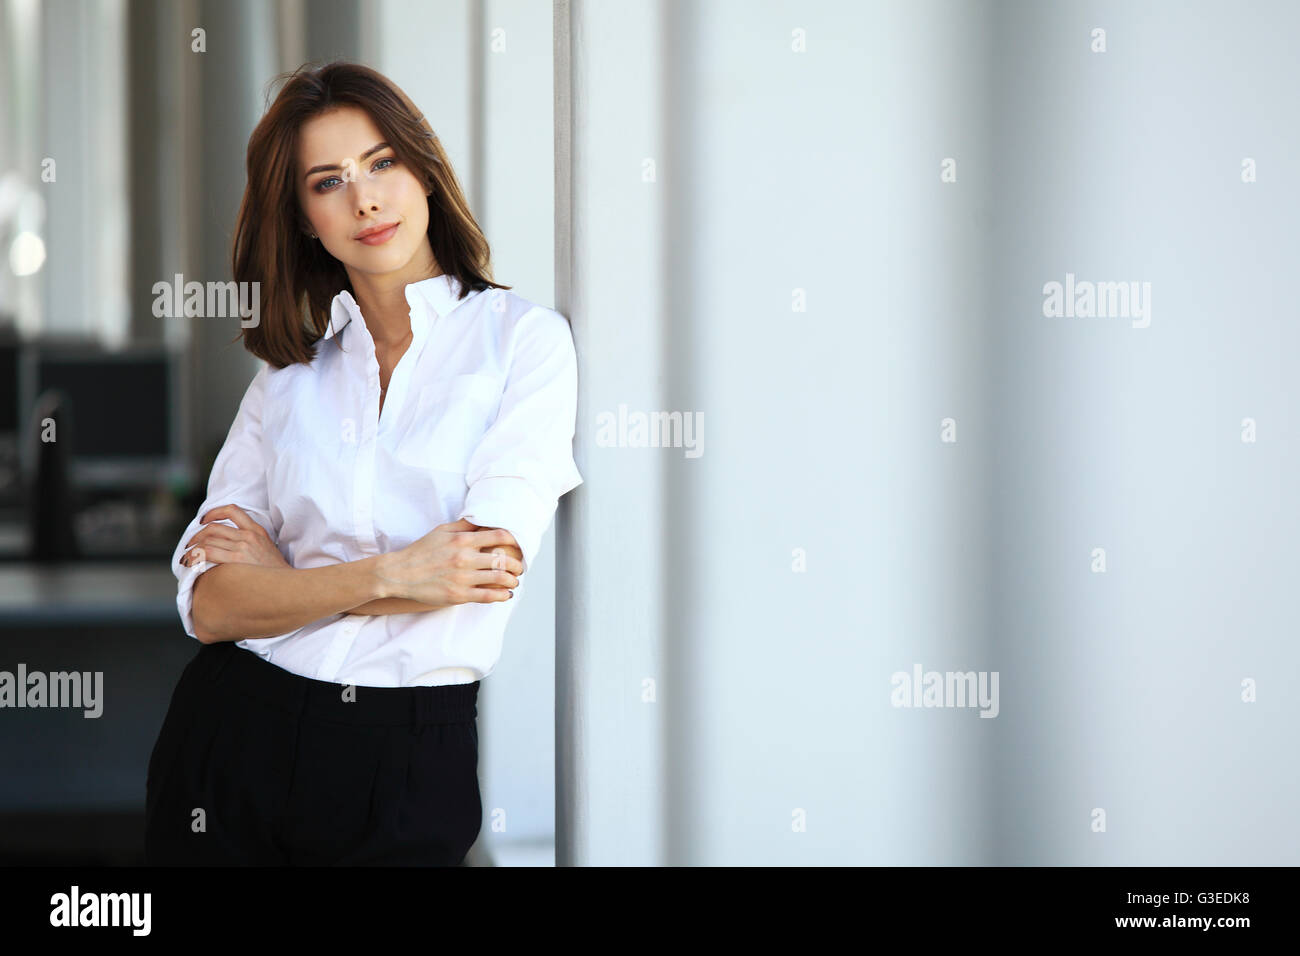 Moderne Business-Frau im Büro mit Textfreiraum Stockbild